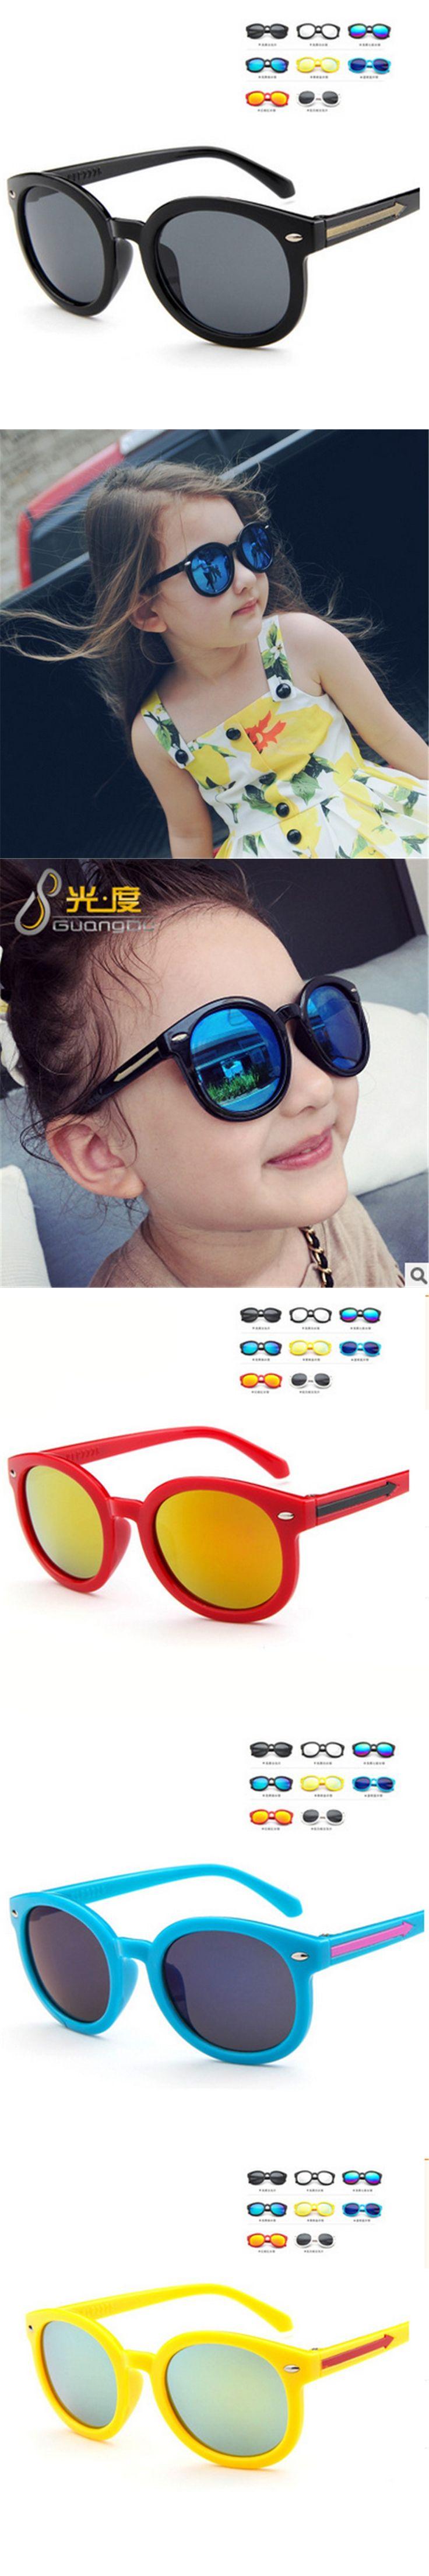 Kids Sunglasses Children Boys Girls Sun Glasses Child Plastic Frame Rivet Colorful Goggles SHADES EyewearMecol 2016 $1.4